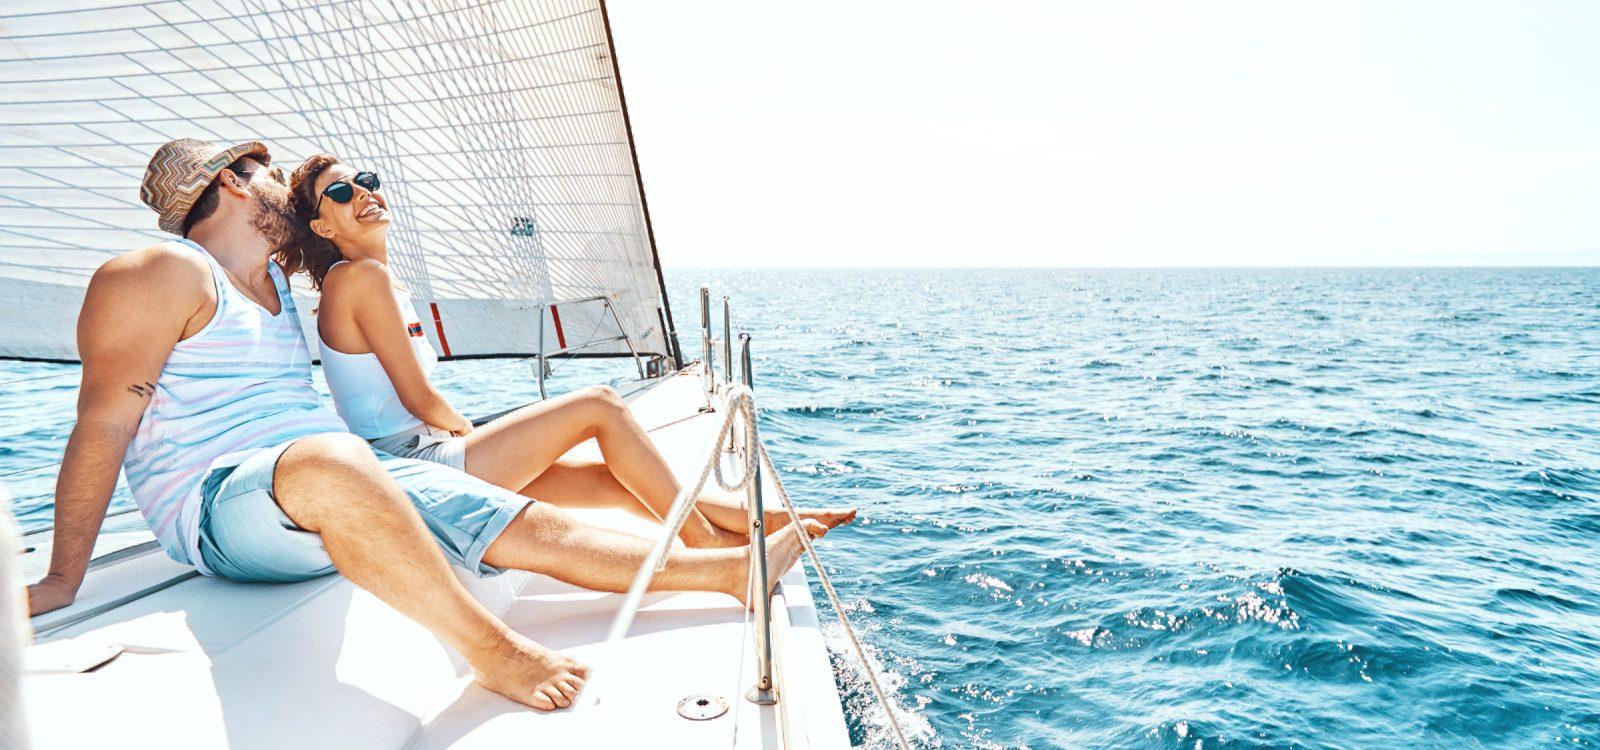 velero vigo alquiler travesia romantica